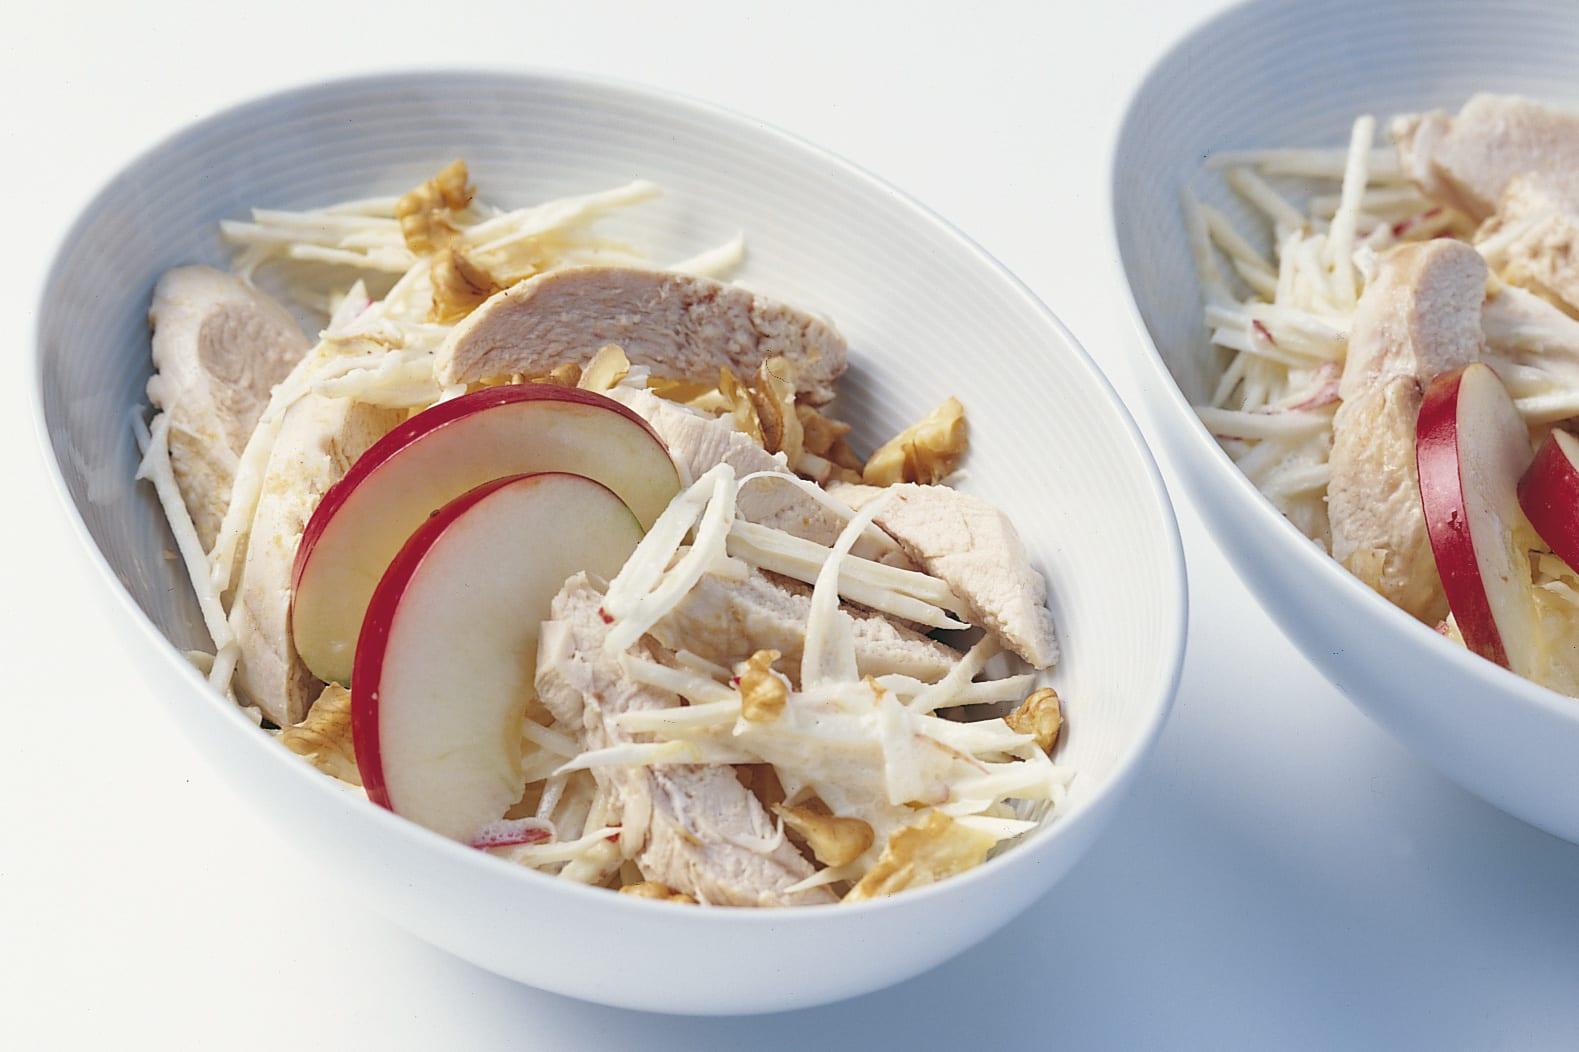 Geflügel-Apfel-Salat mit Crème fraîche